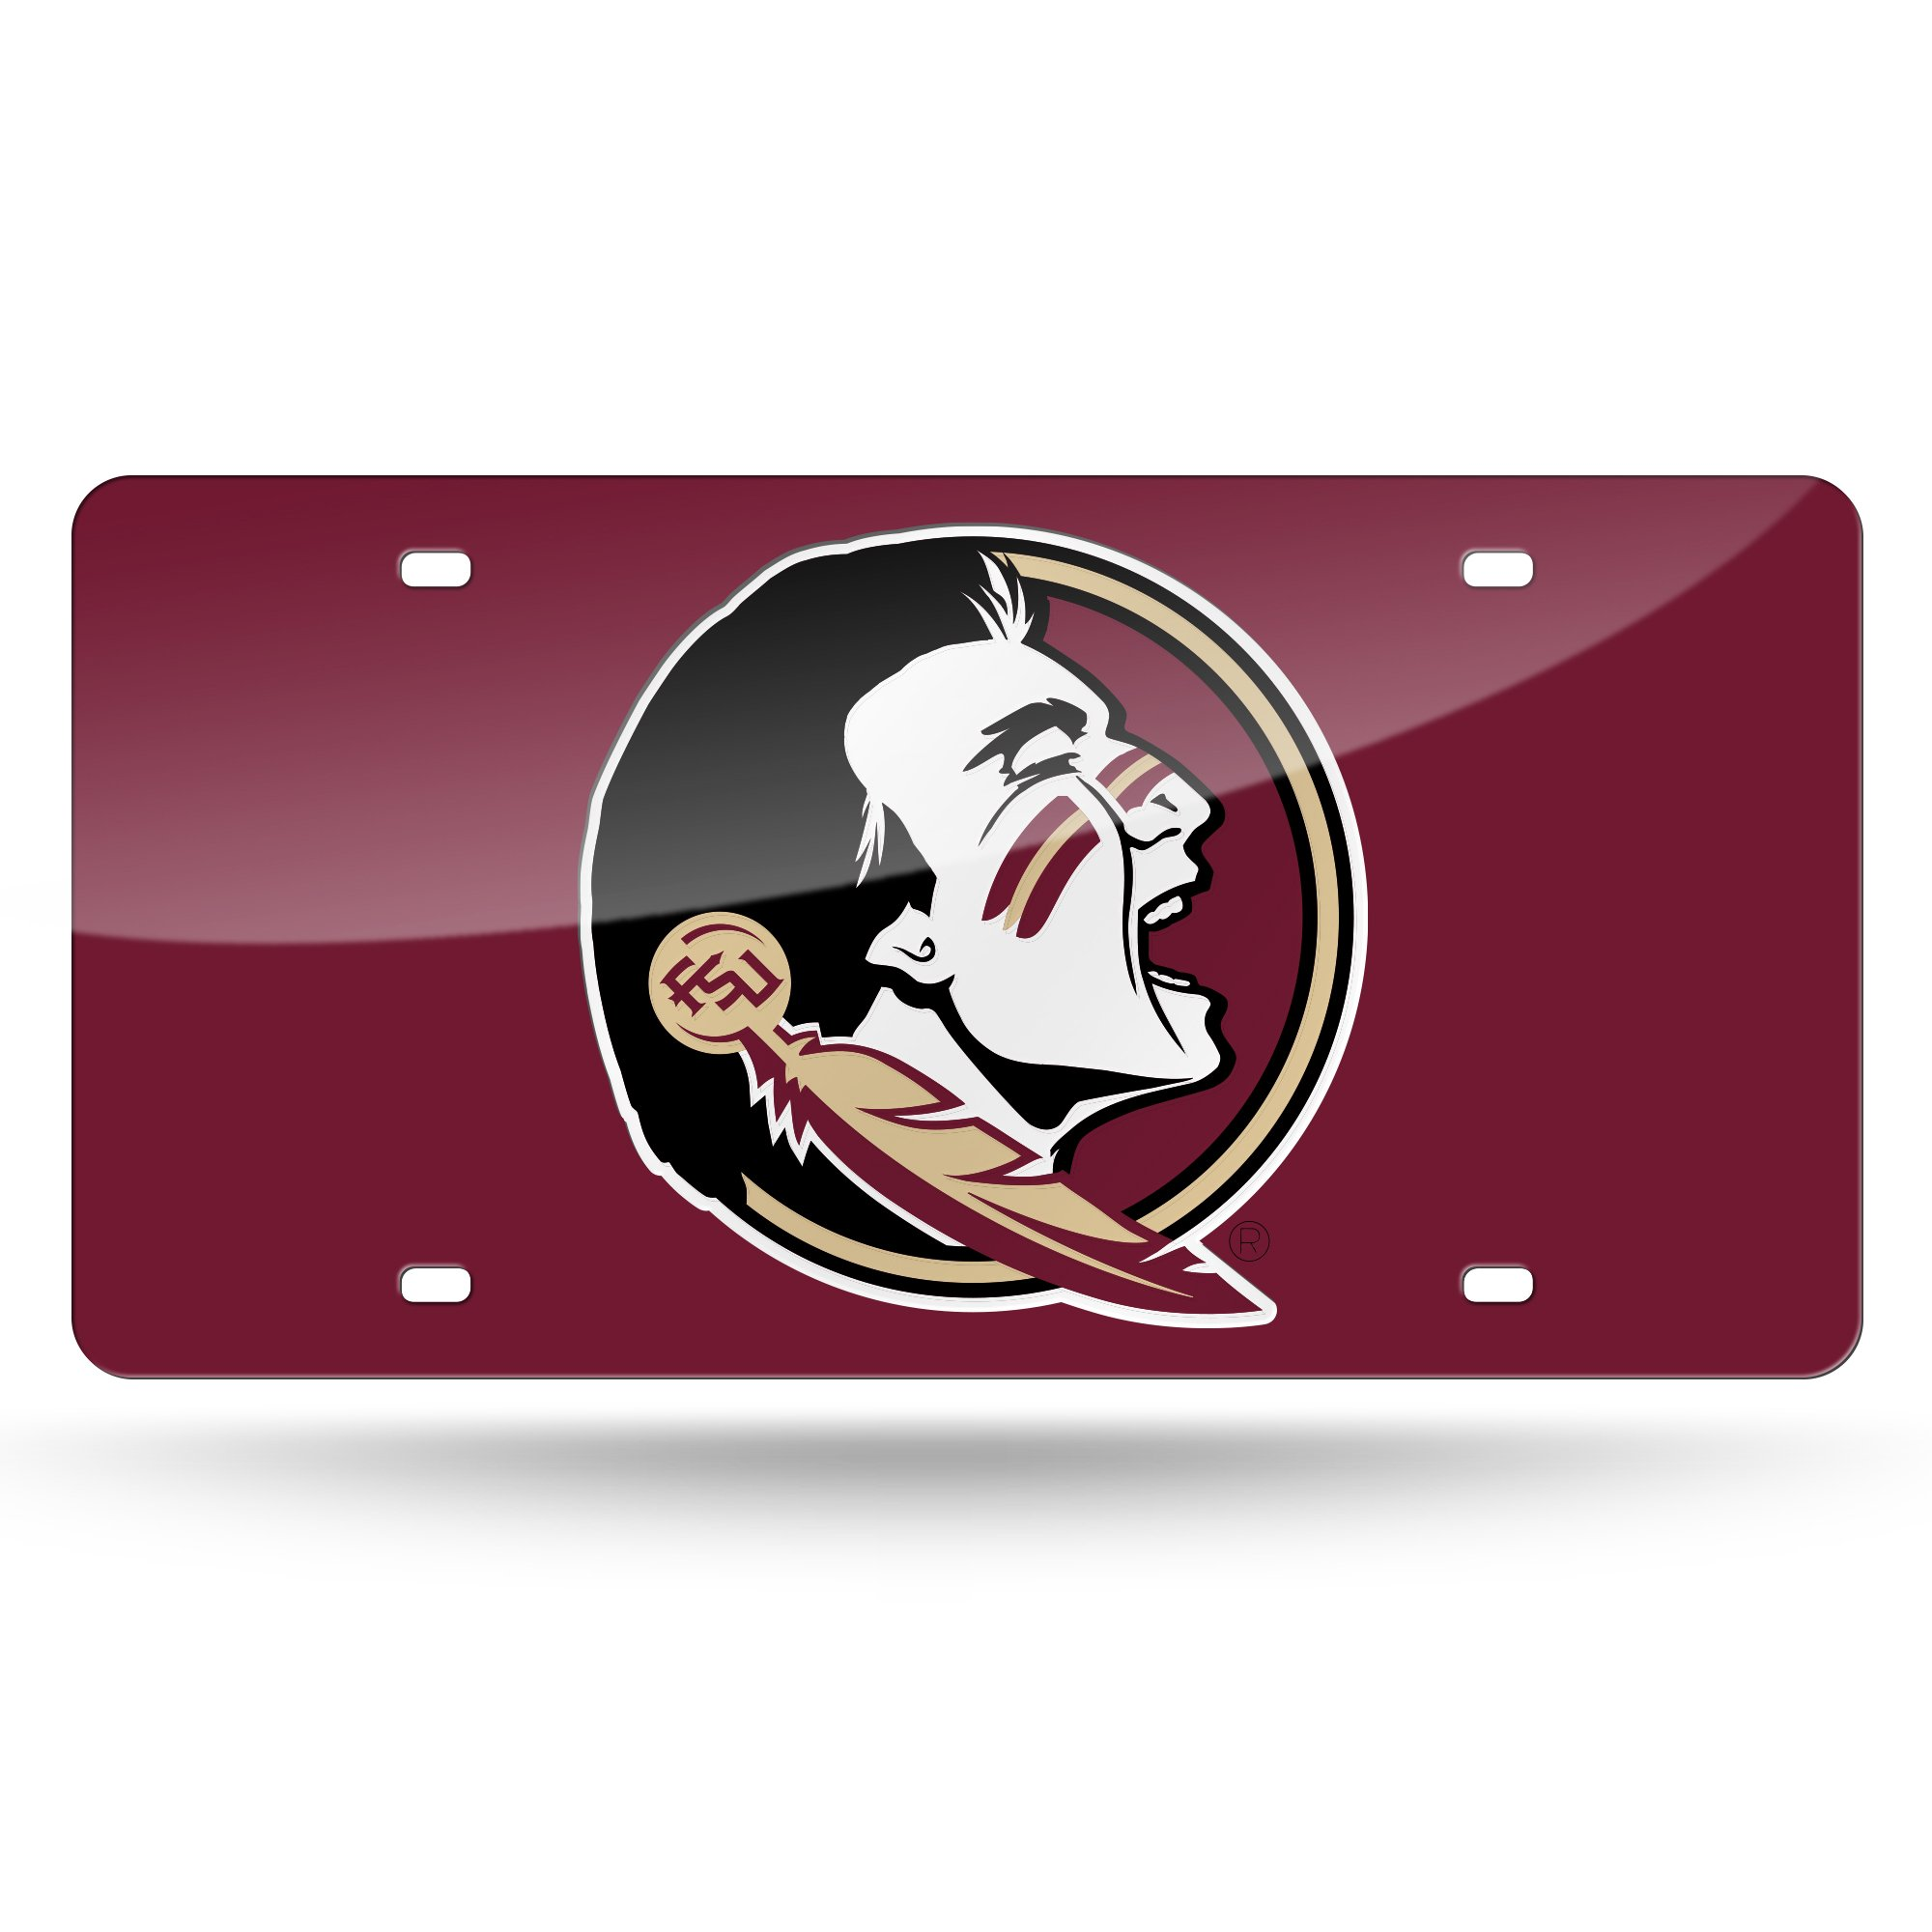 NCAA Florida State Seminoles Laser Inlaid Metal License Plate Tag, 6'' x 12'', Red